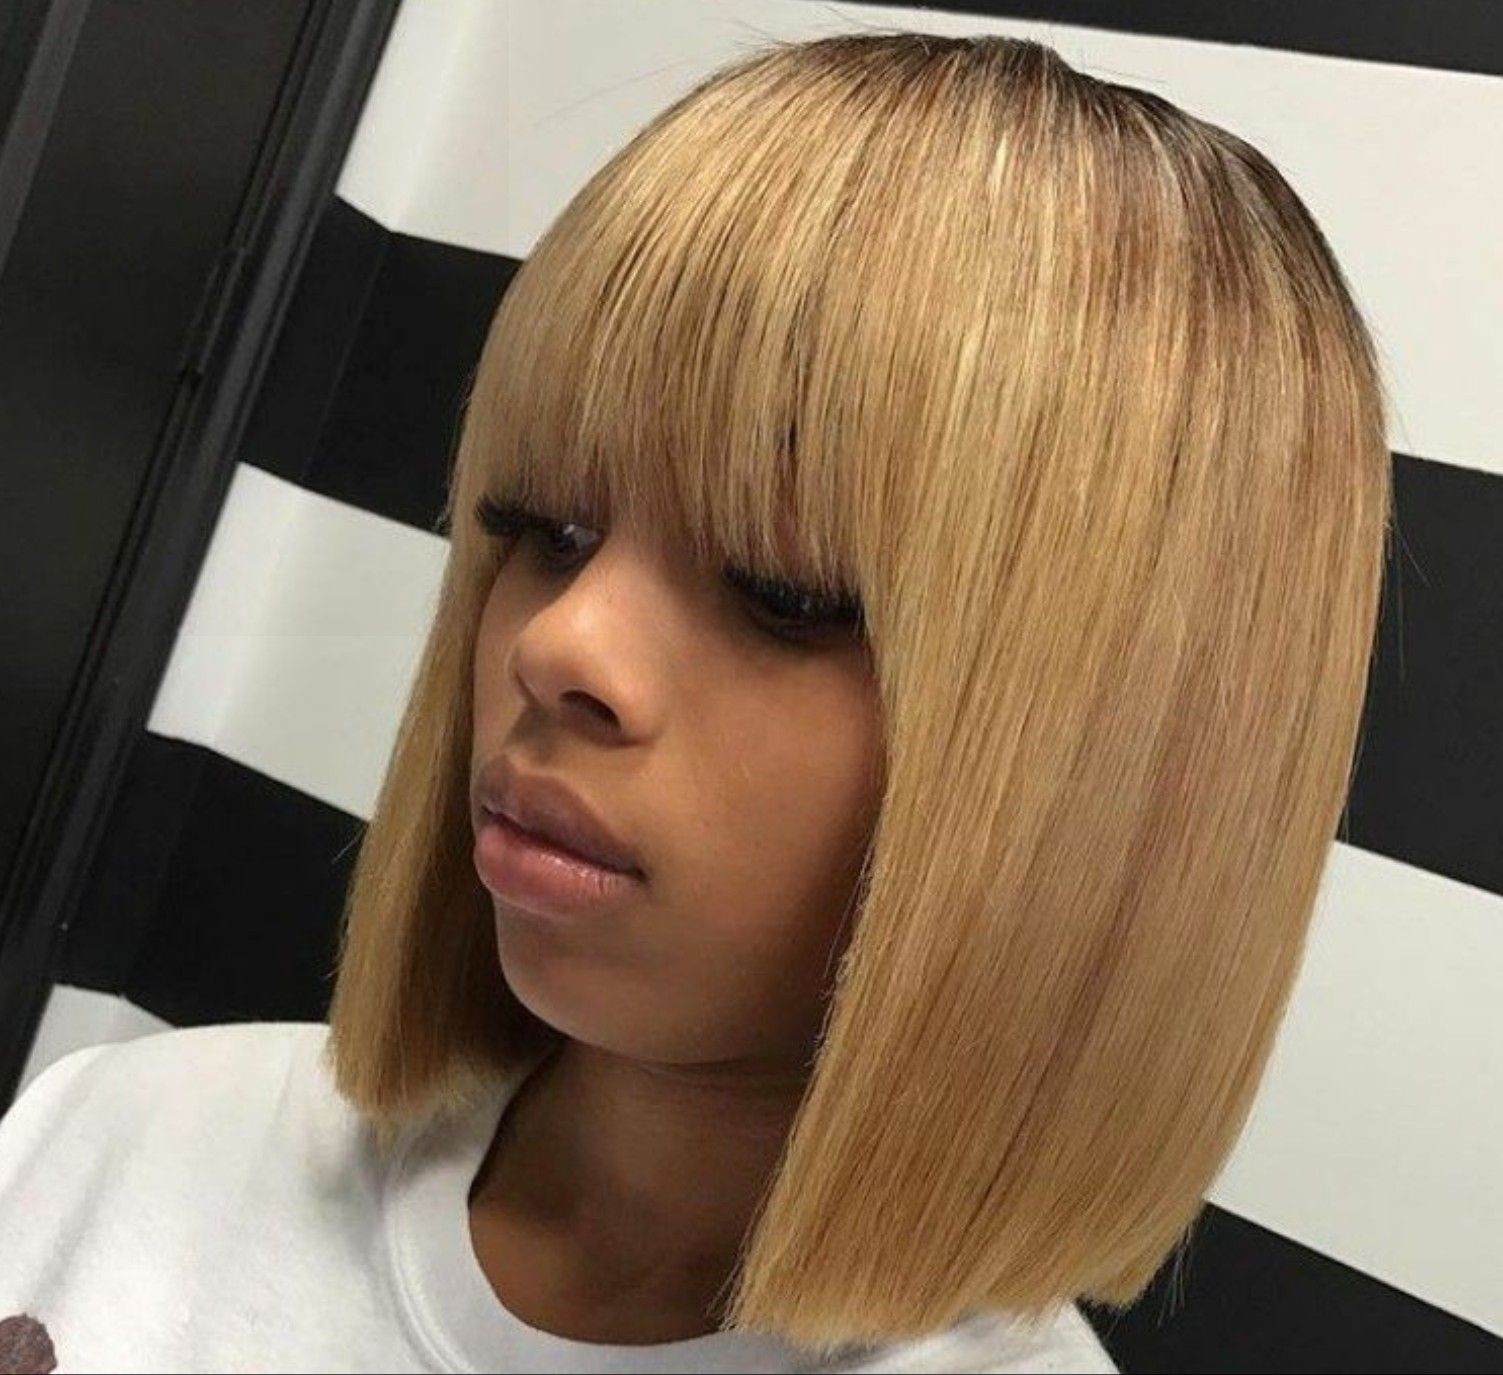 vanityjada | hair & make-up | hair styles, short hair styles